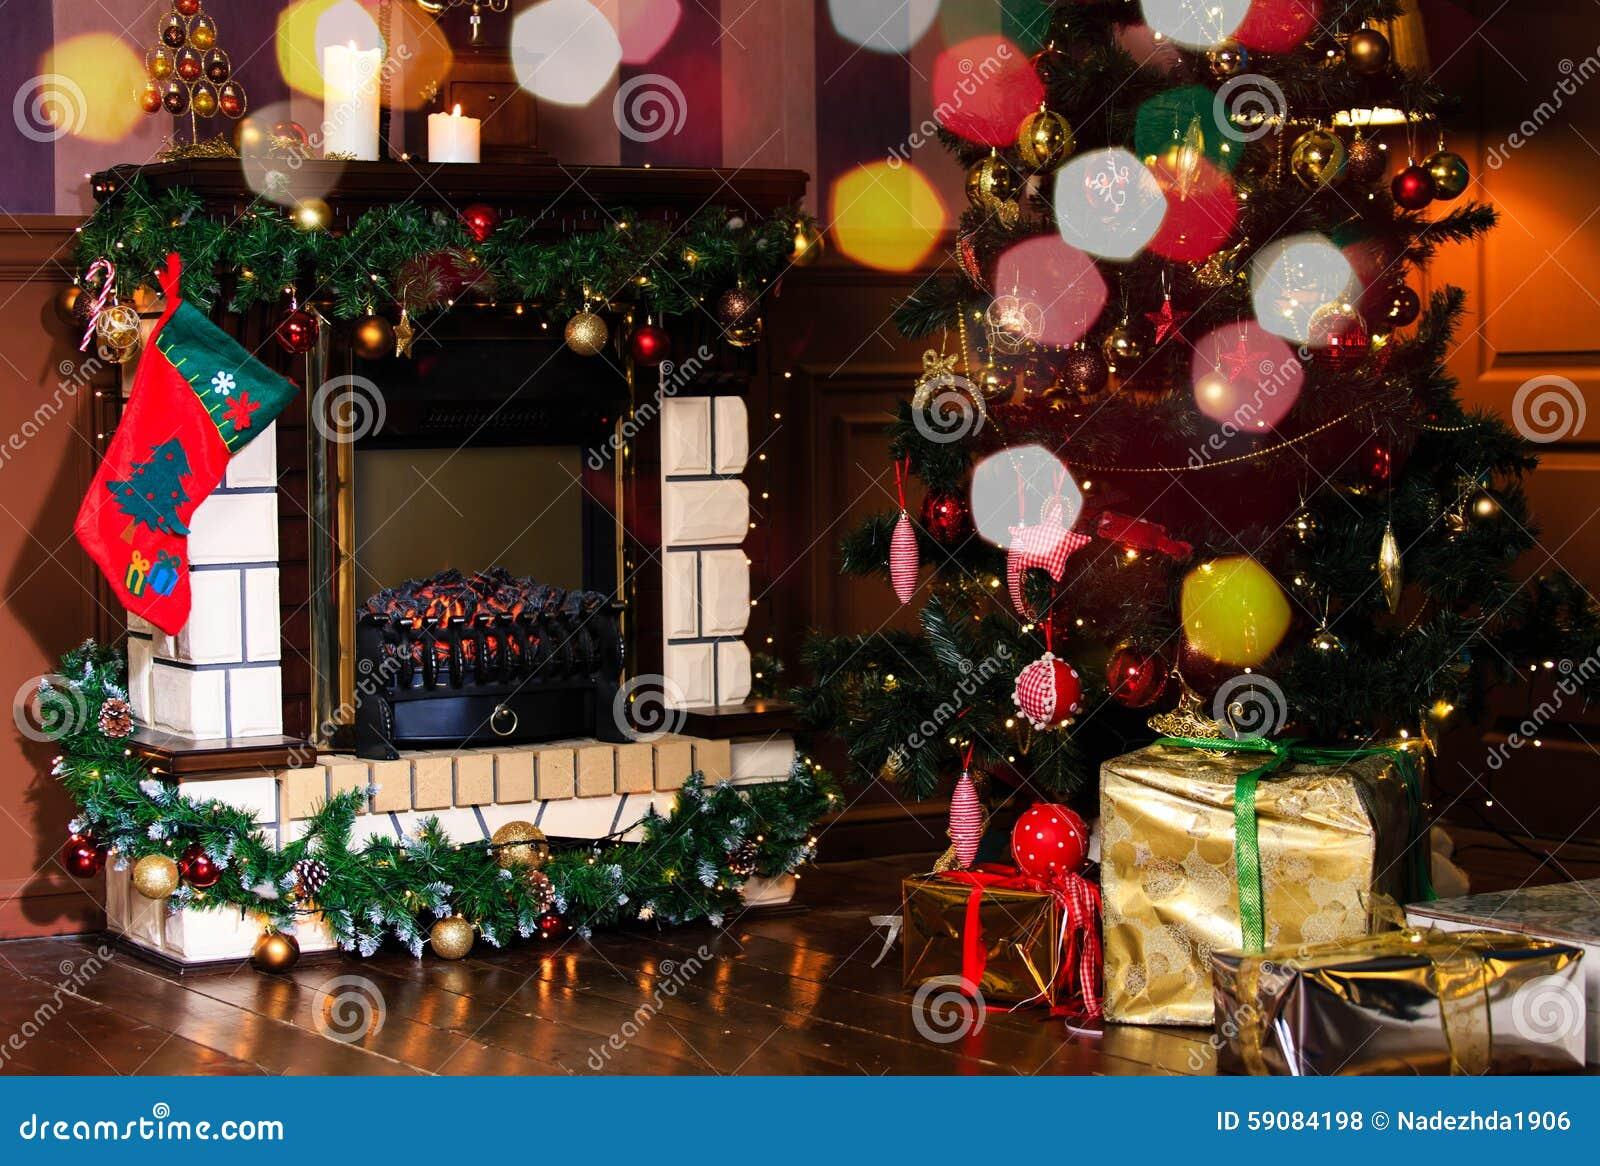 Christmas Living Room Interior Decoration Stock Photo